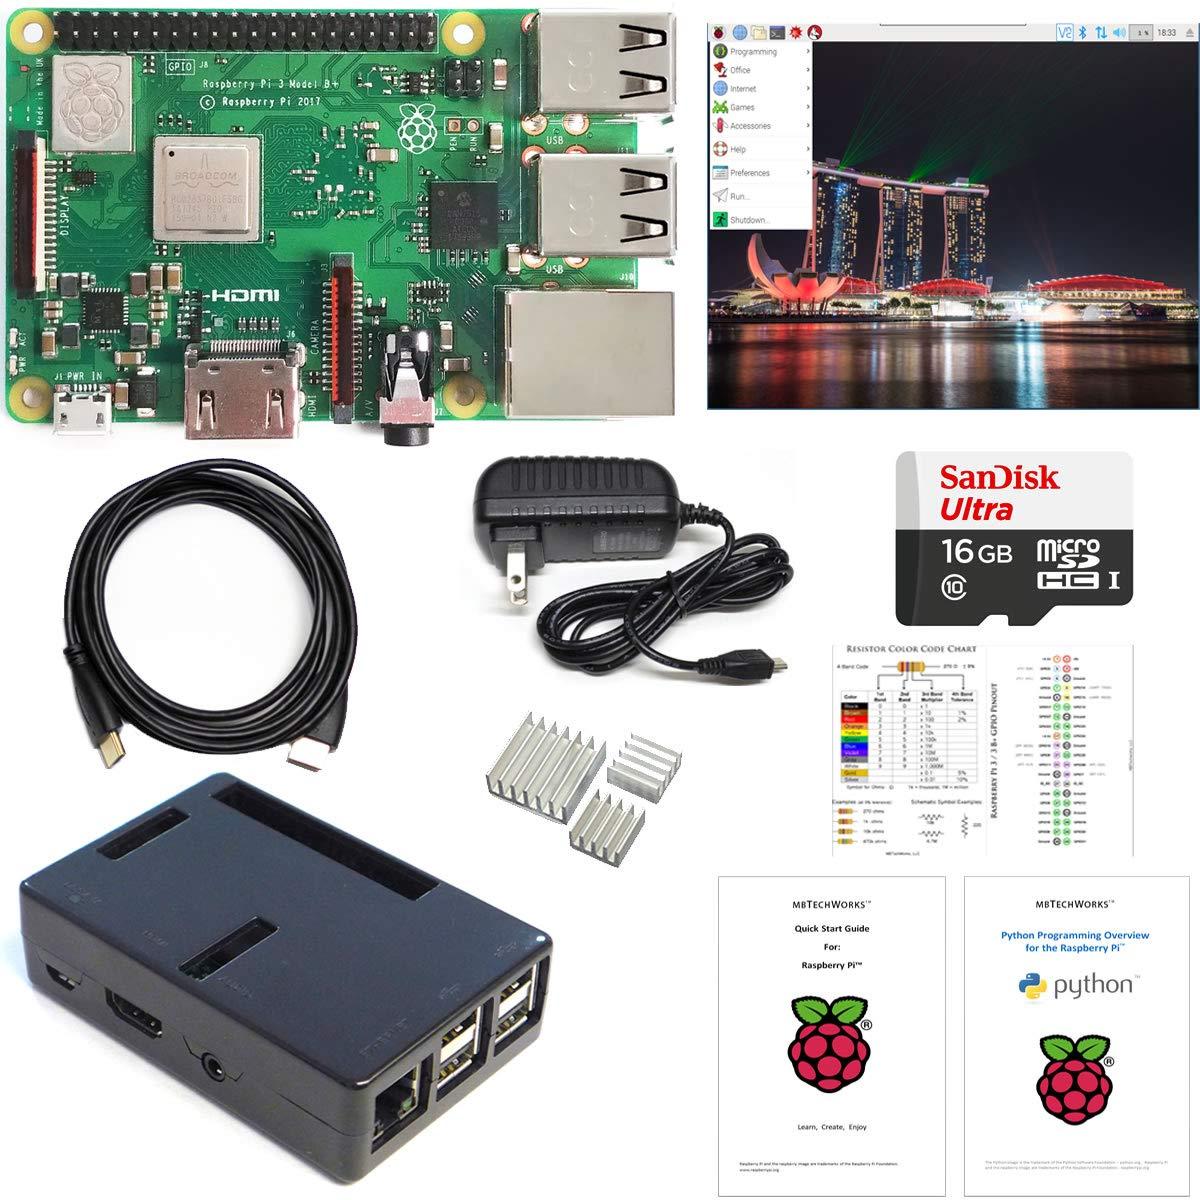 MBTechWorks Raspberry Pi 3 B+ Computer Kit, 16GB High-speed micro SD, Raspbian, WiFi, Bluetooth, 3A Power Supply, Black Case